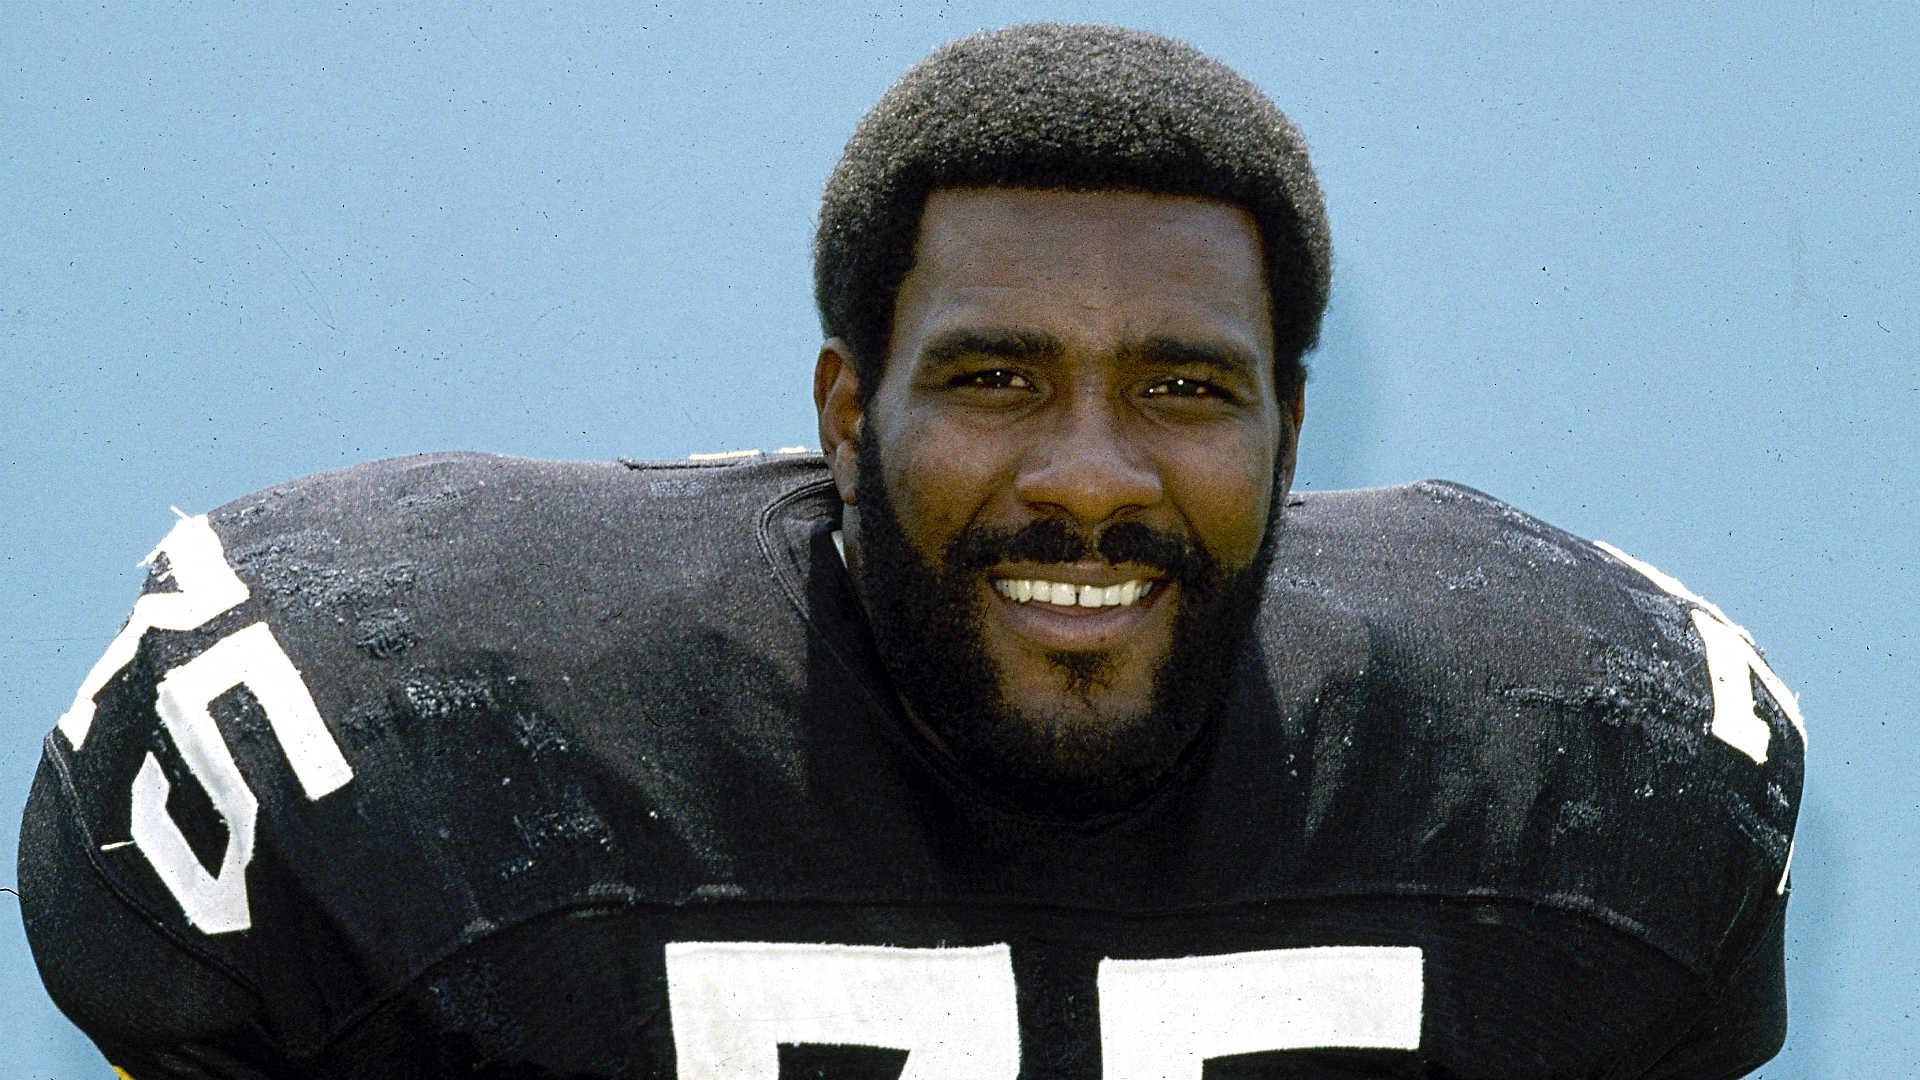 42b7523107b Very nice: Steelers finally retire 'Mean Joe' Greene's No. 75 | Sporting  News